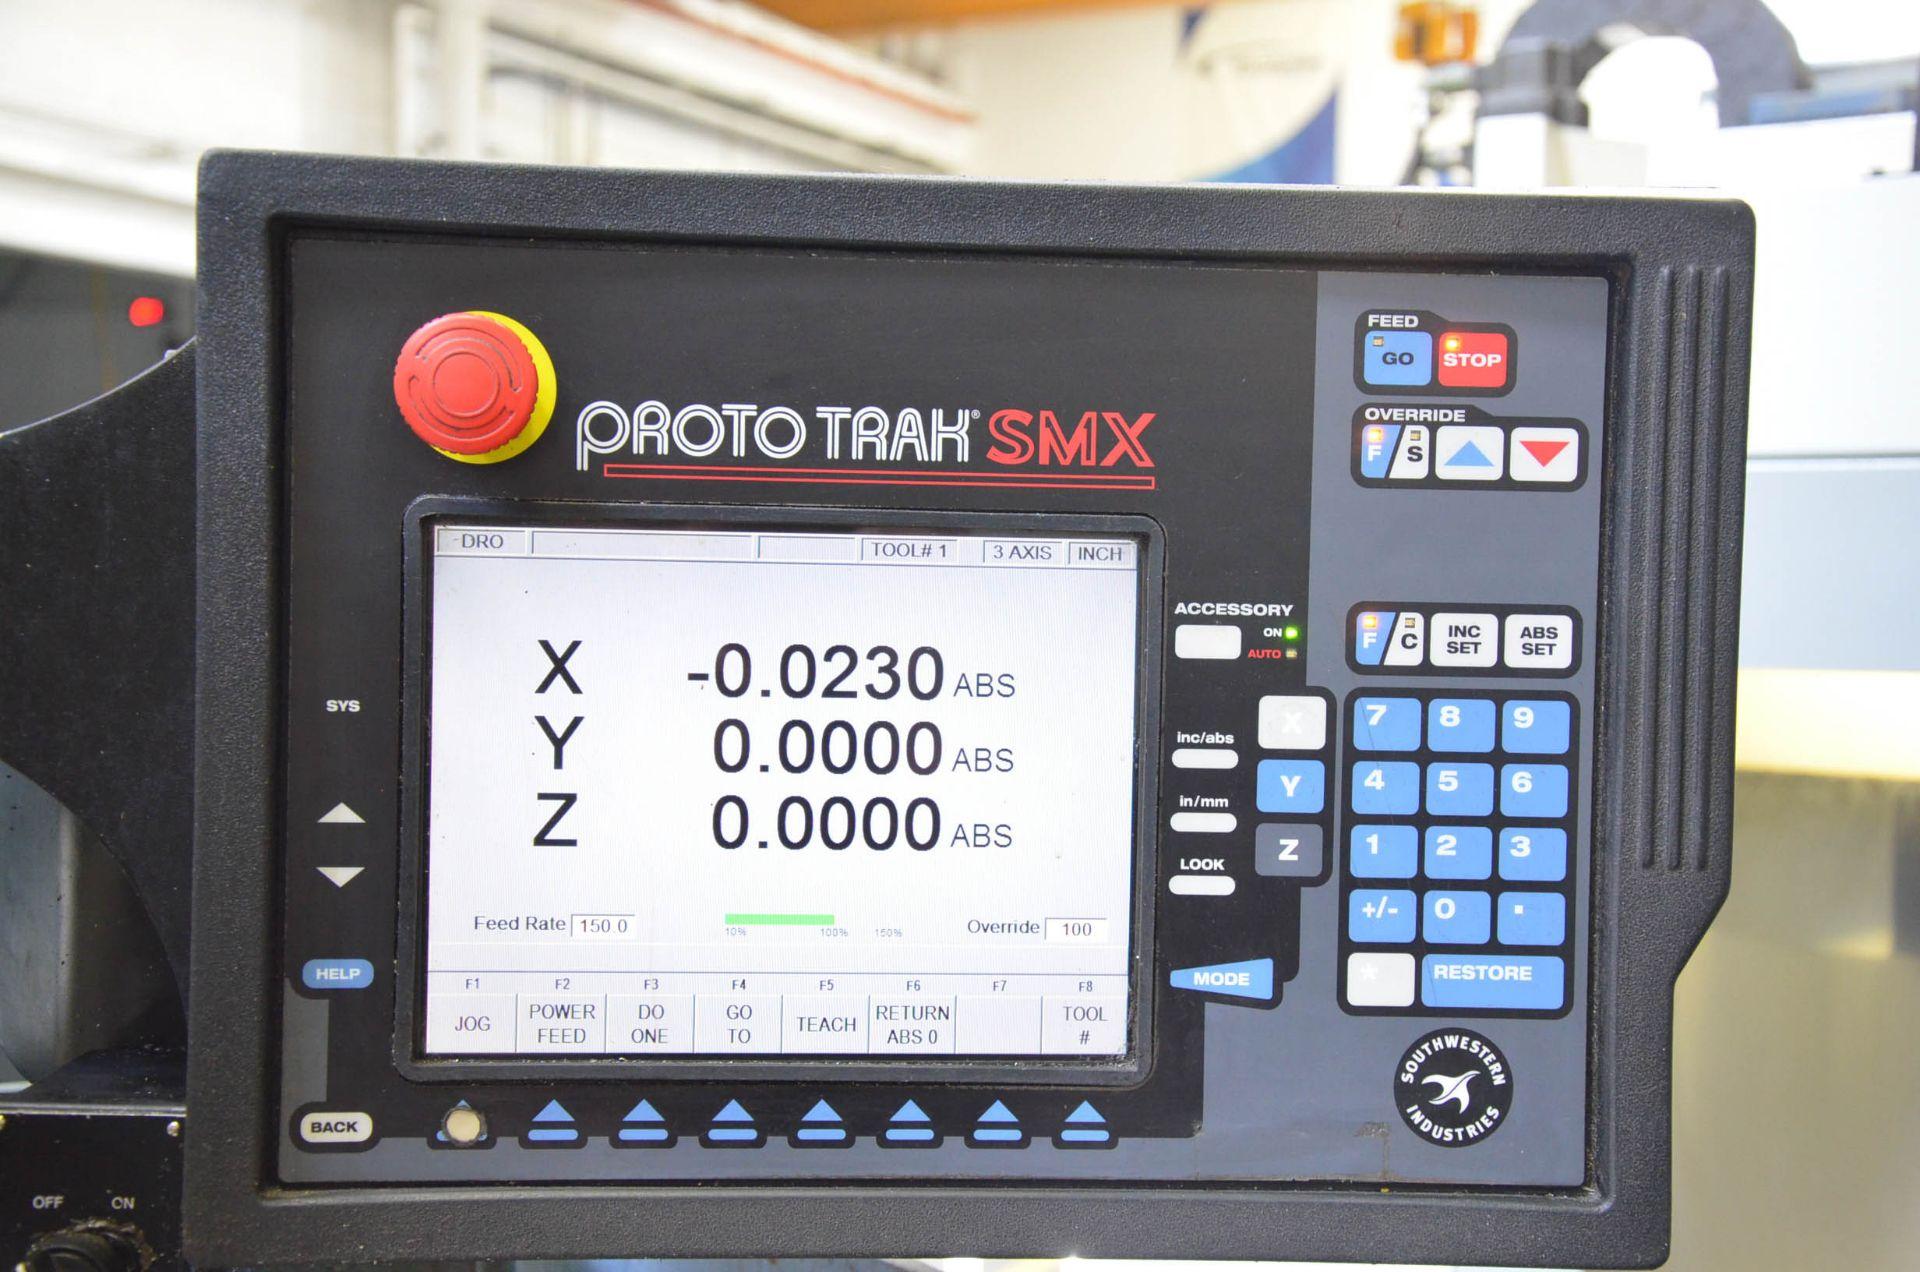 "TRAK DPM3 CNC VERTICAL TURRET MILLING MACHINE WITH PROTO TRAK (2007) SMX CNC CONTROL, 10"" X 50"" - Image 5 of 7"